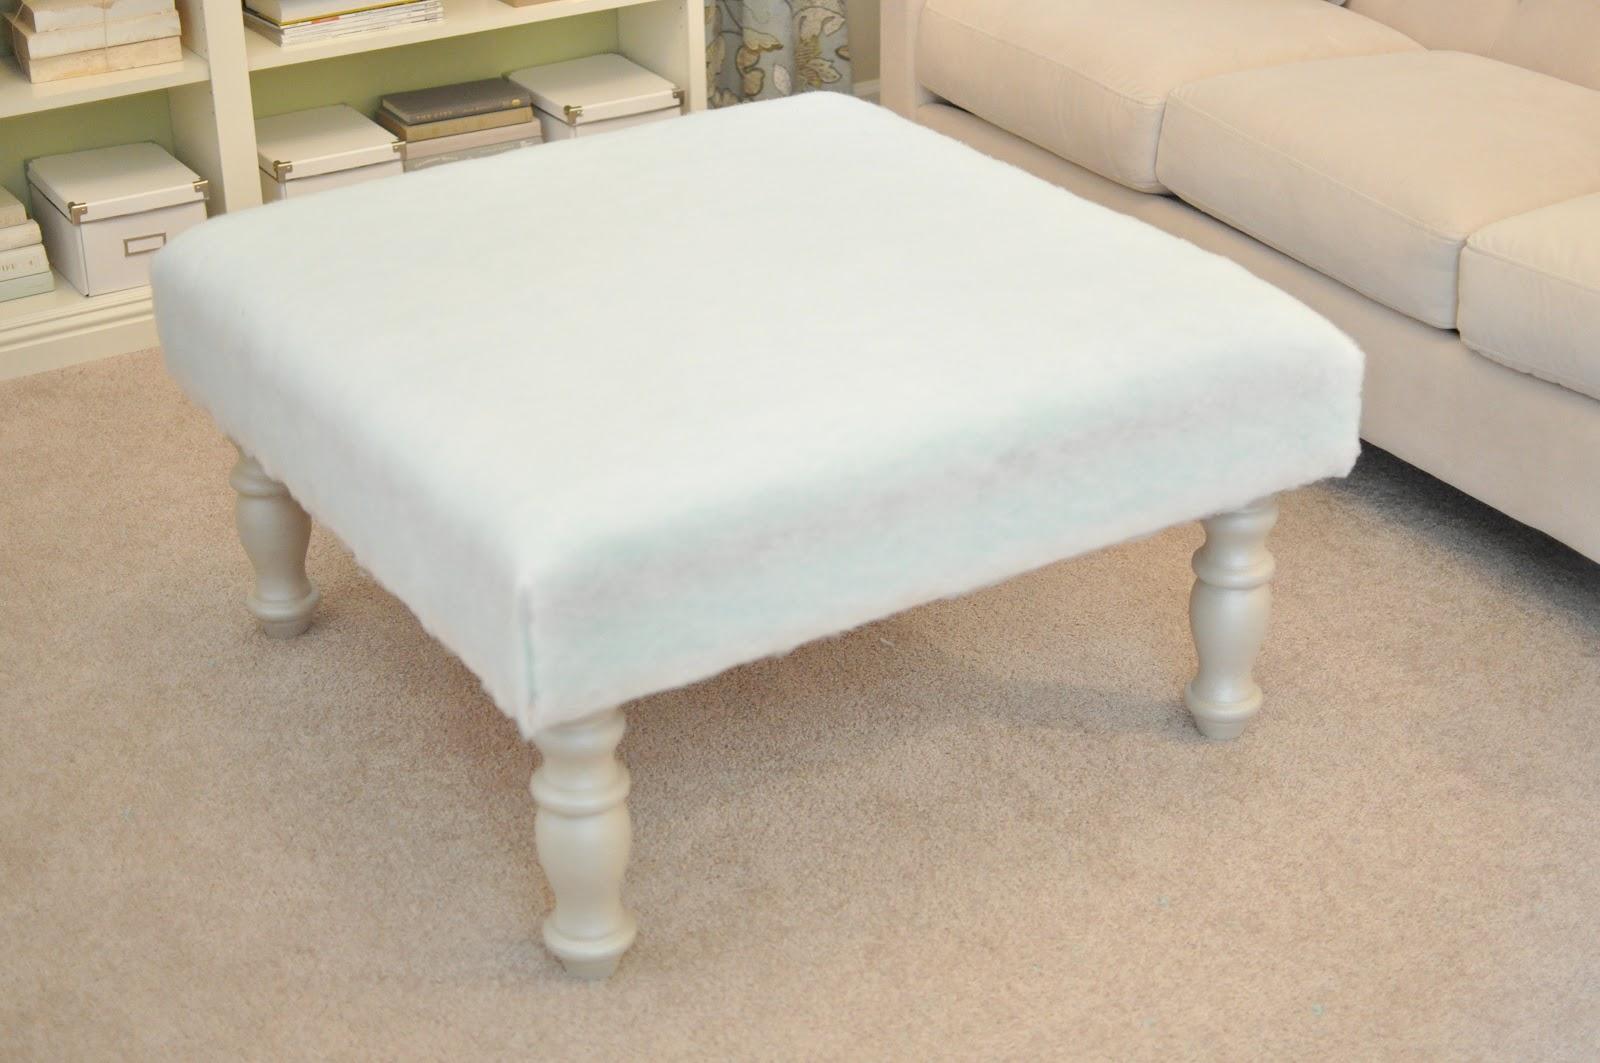 Creative diy furniture hacks upholstered ottoman the art in life - Creative diy ottoman ideas ...